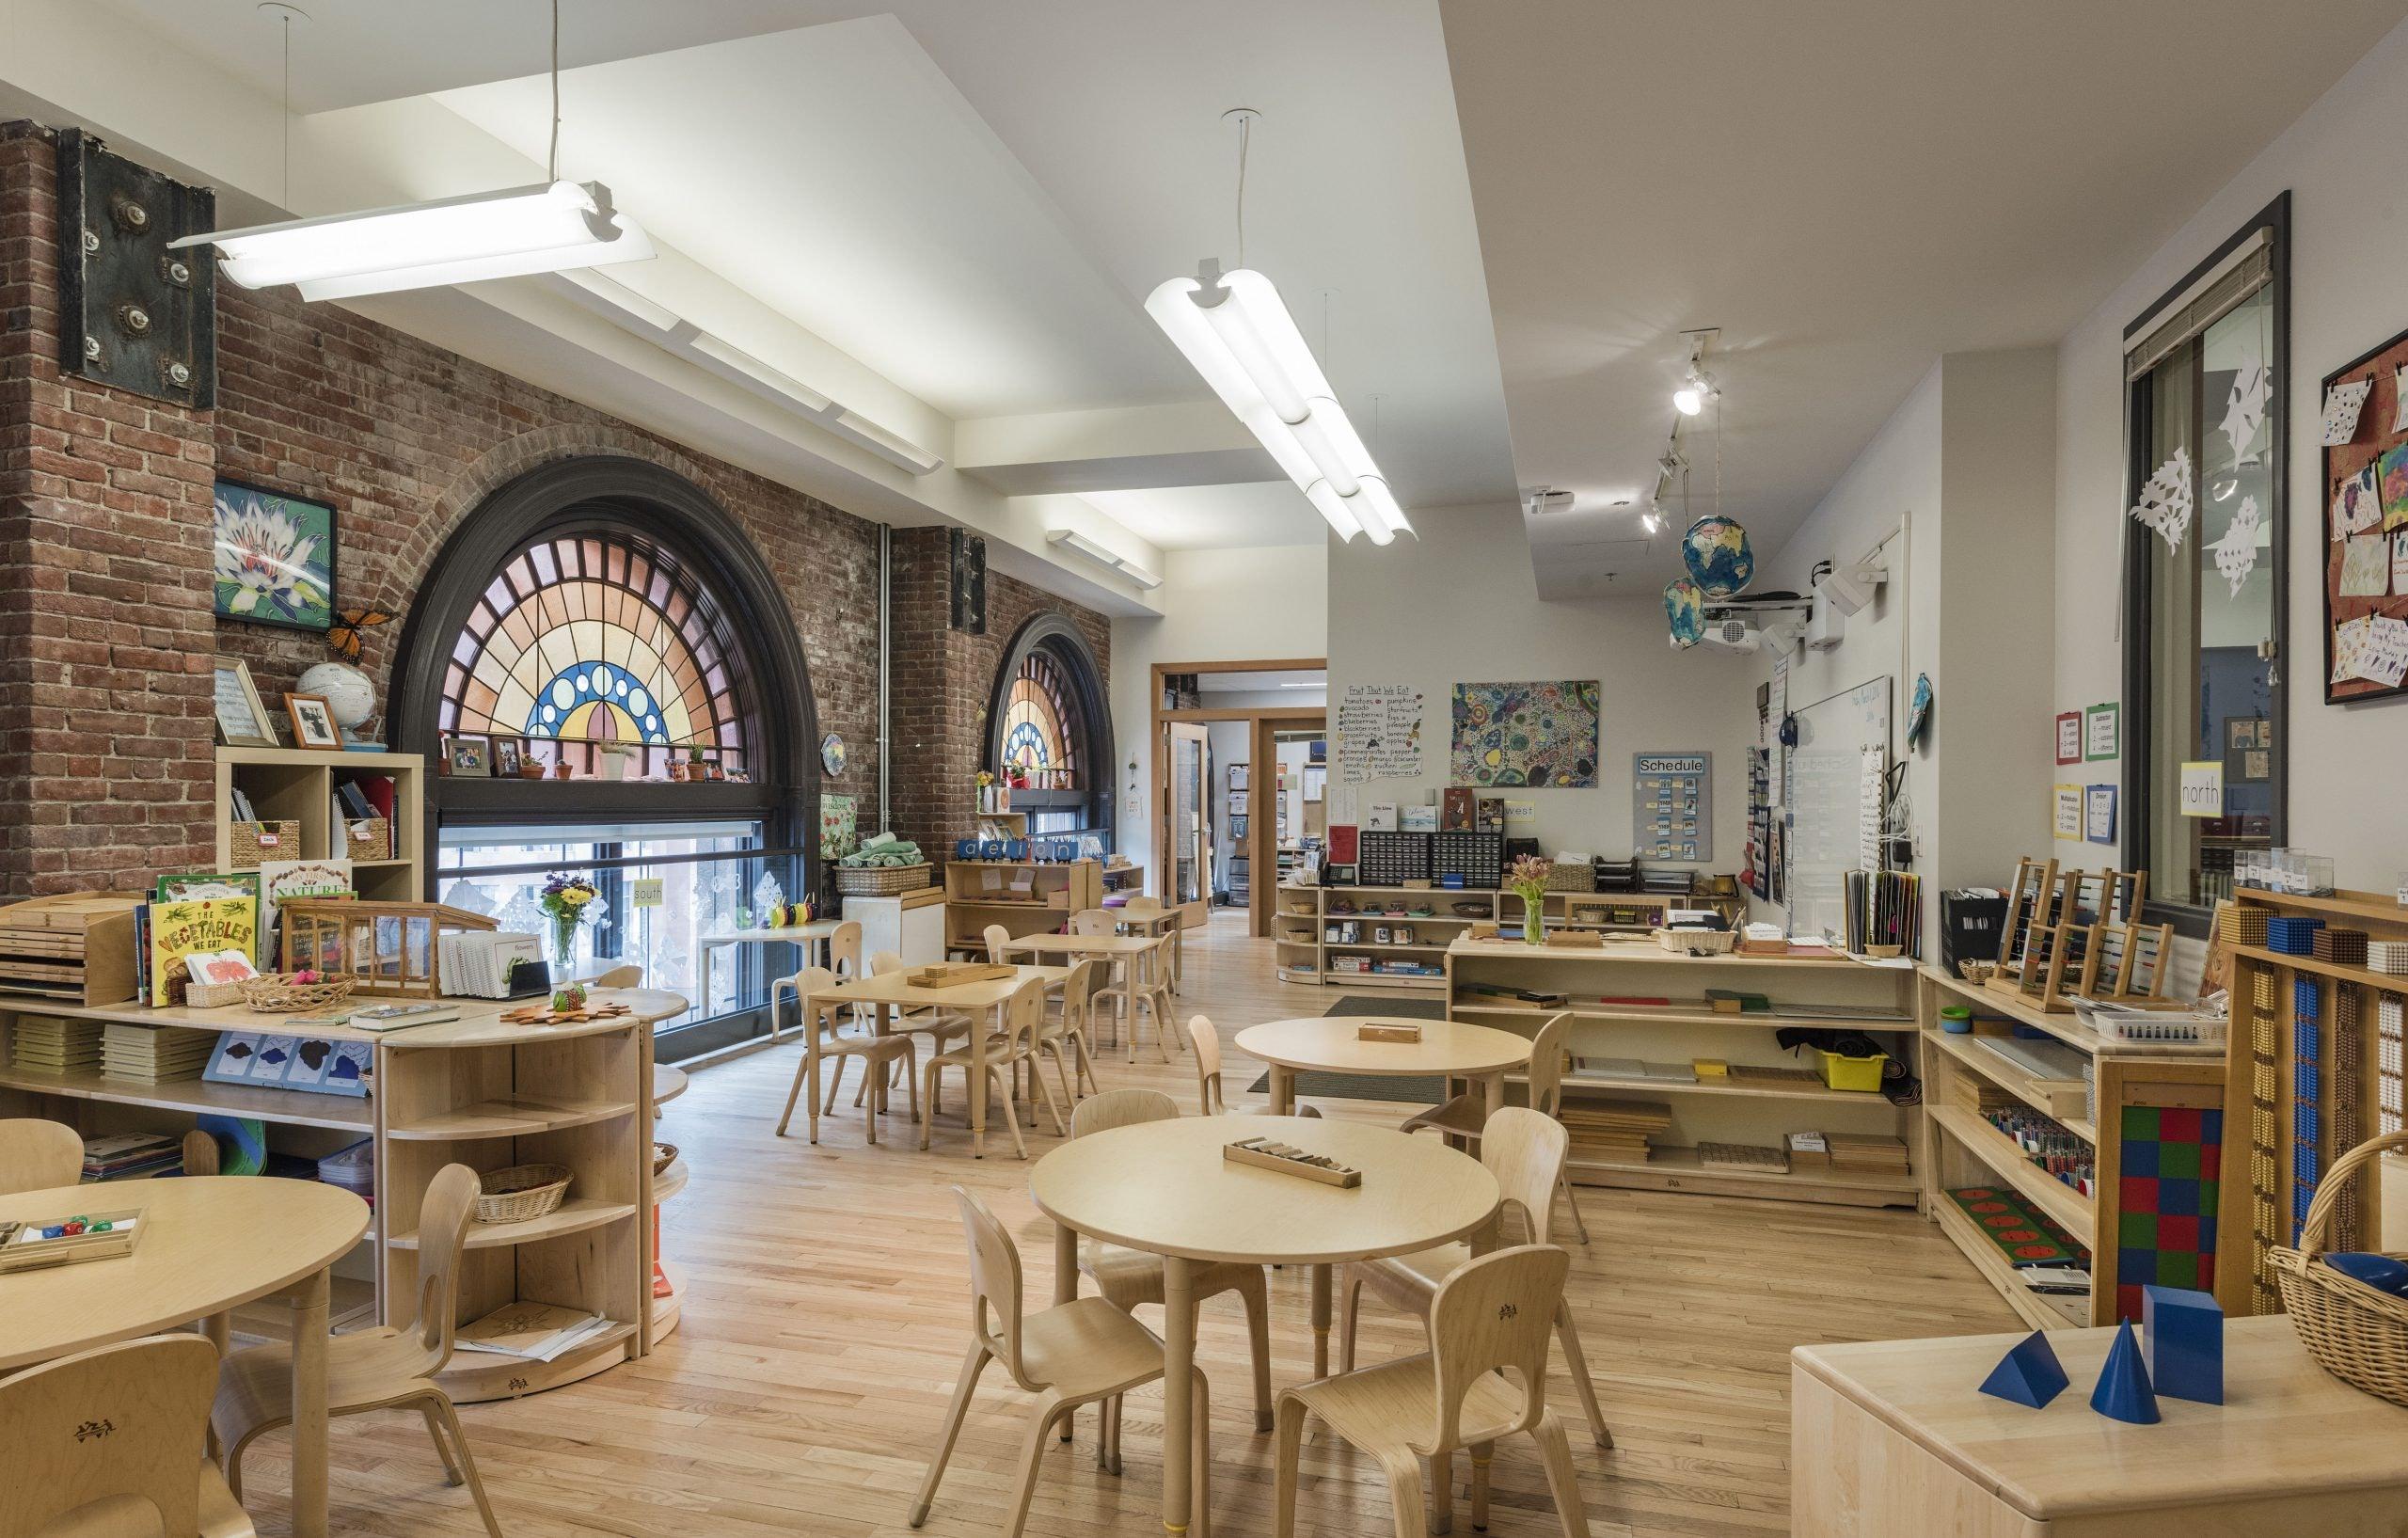 Kingsley Montessori School – Renovation and Expansion